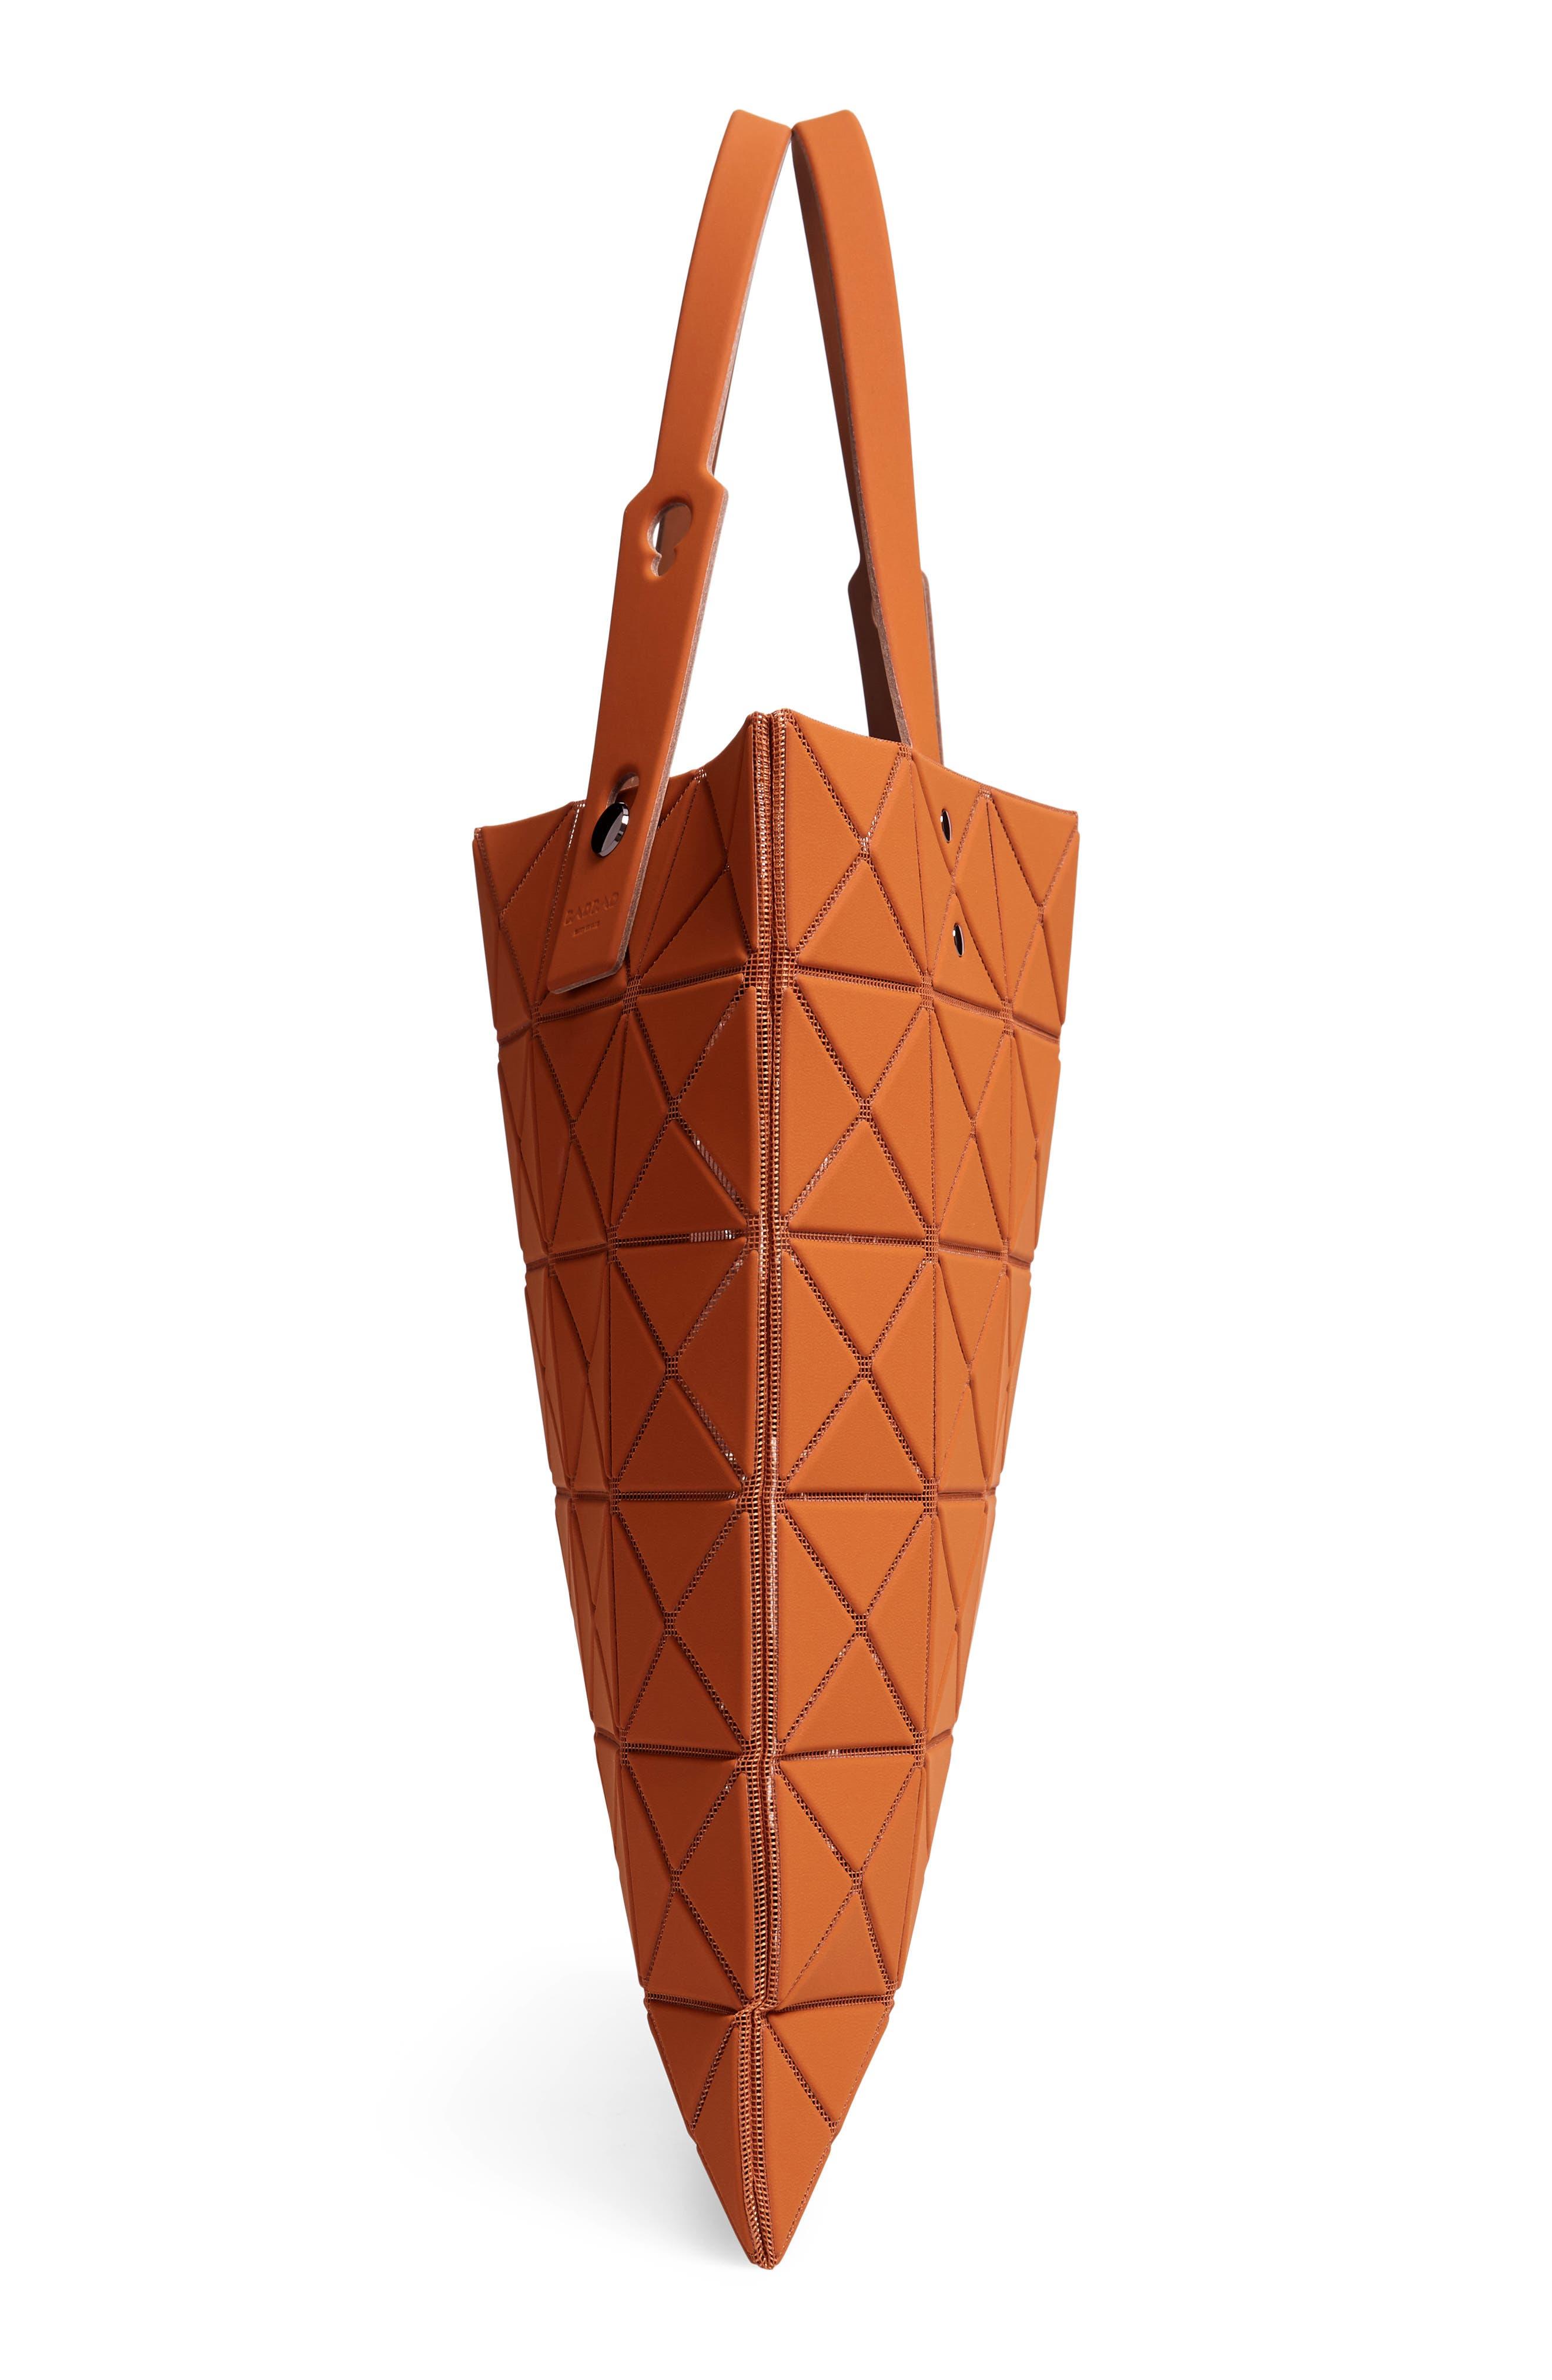 Lucent Prism Tote Bag,                             Alternate thumbnail 5, color,                             CAMEL